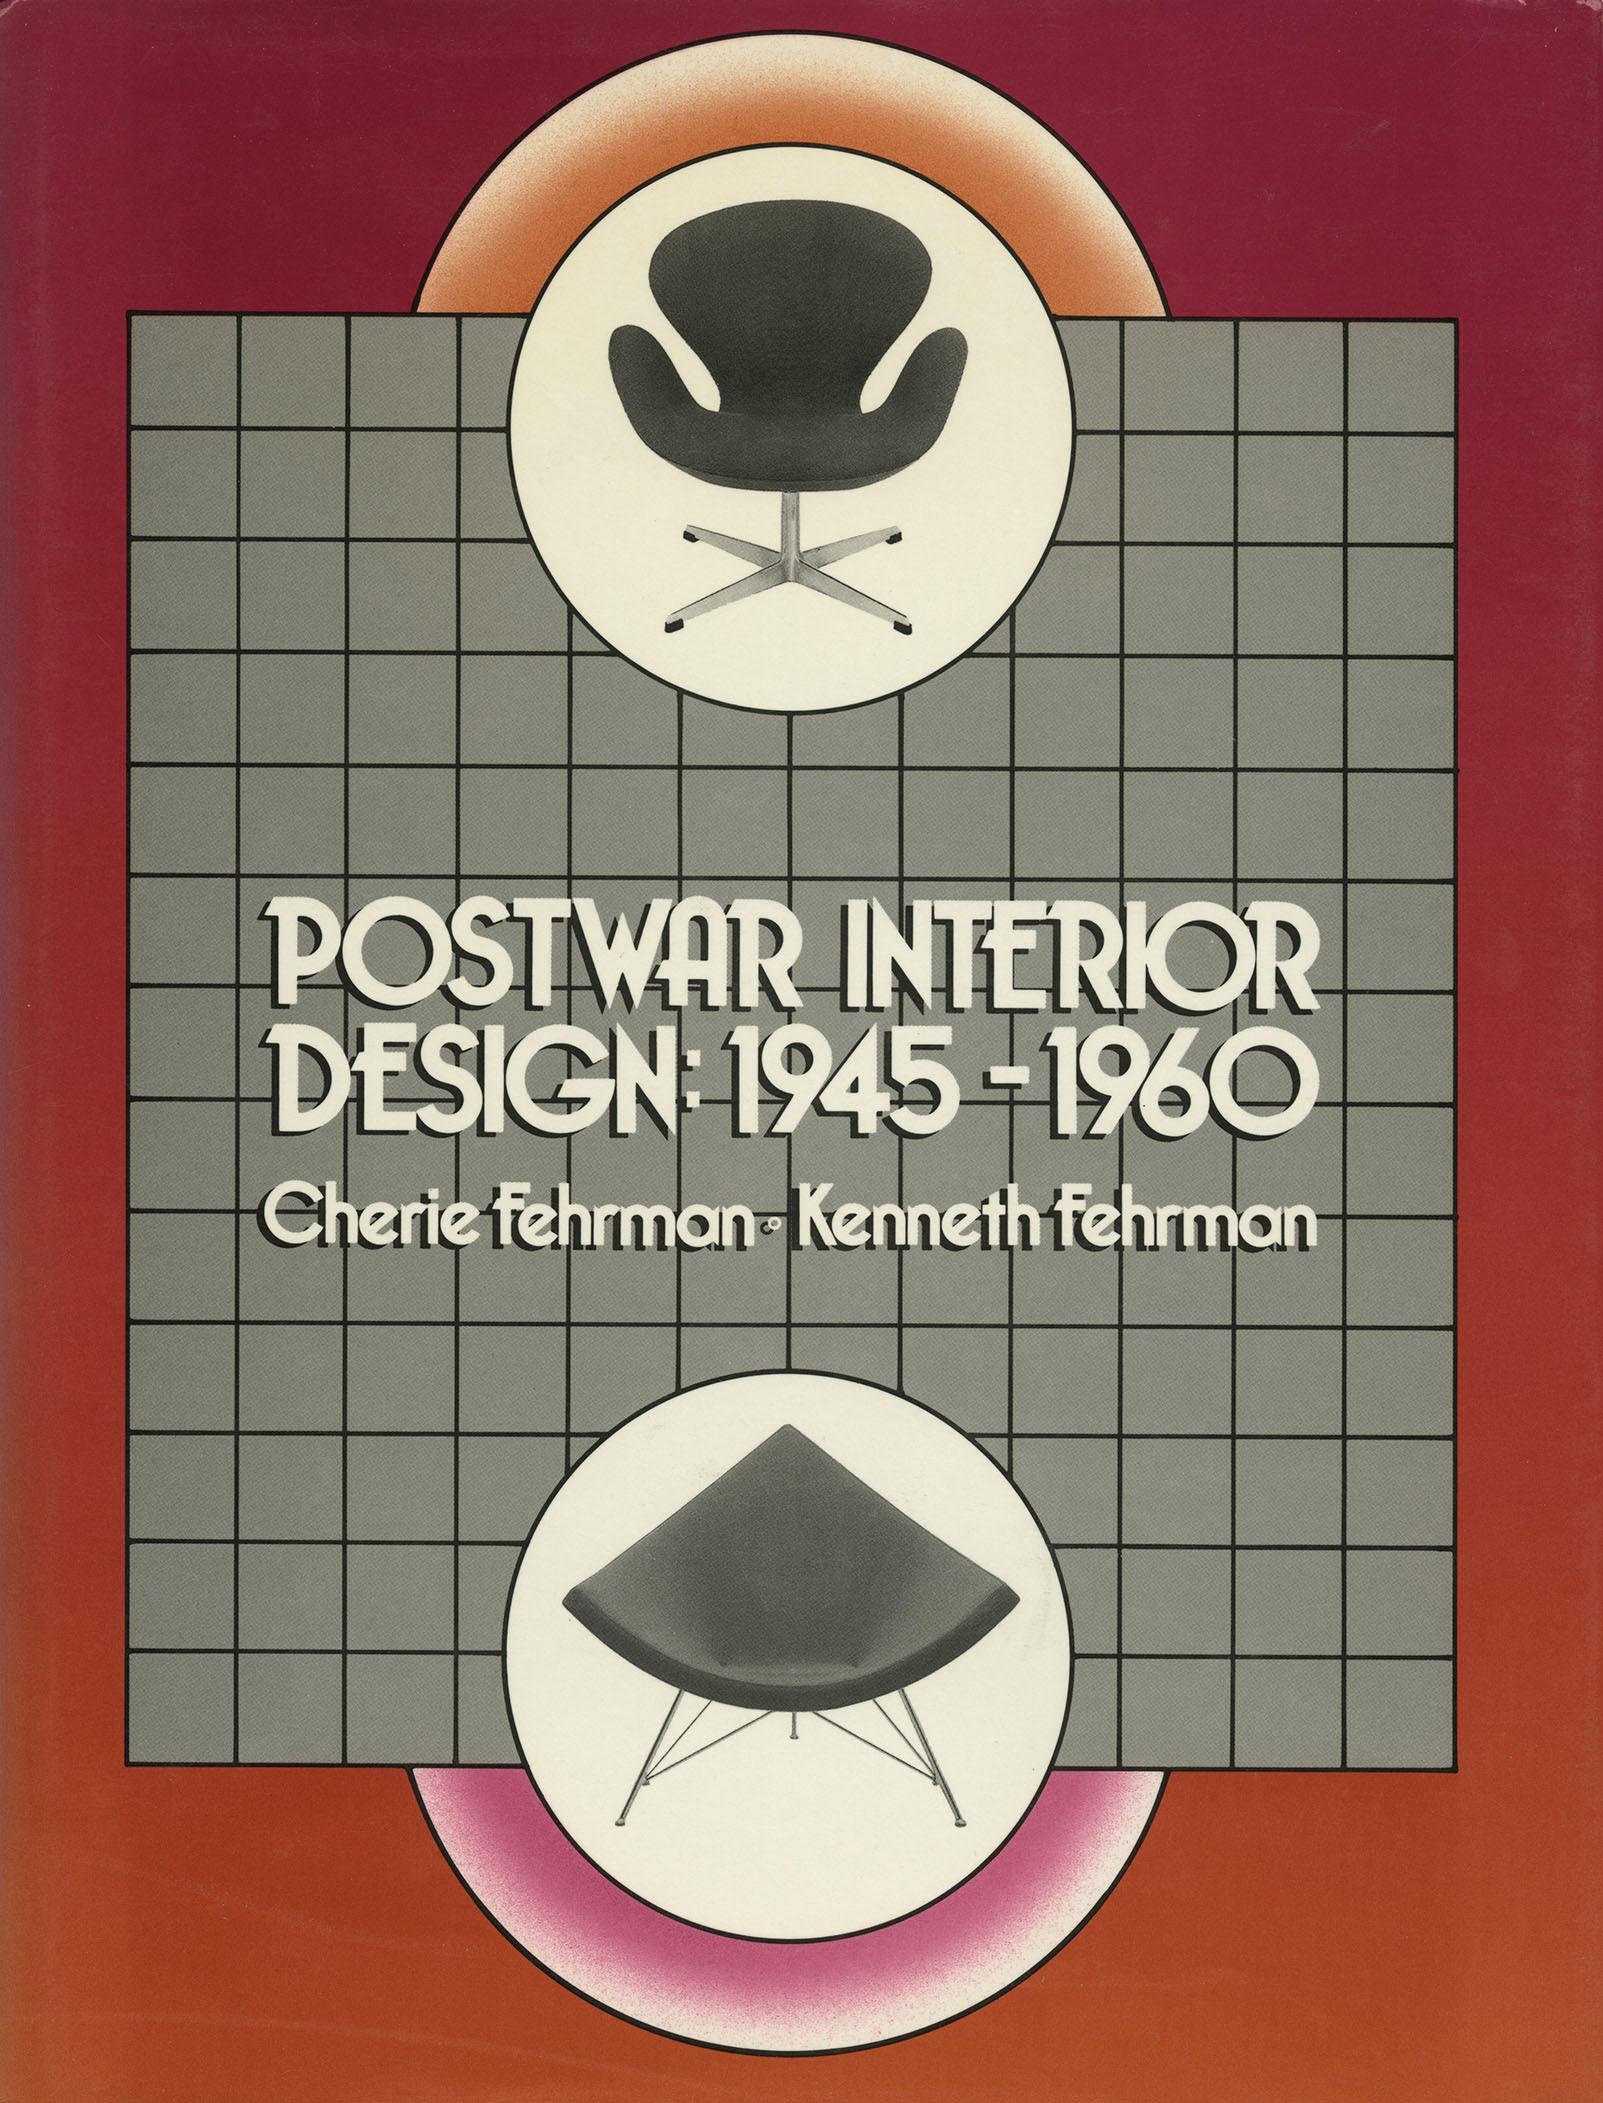 Postwar Interior Design 1945 1960 Eames Office